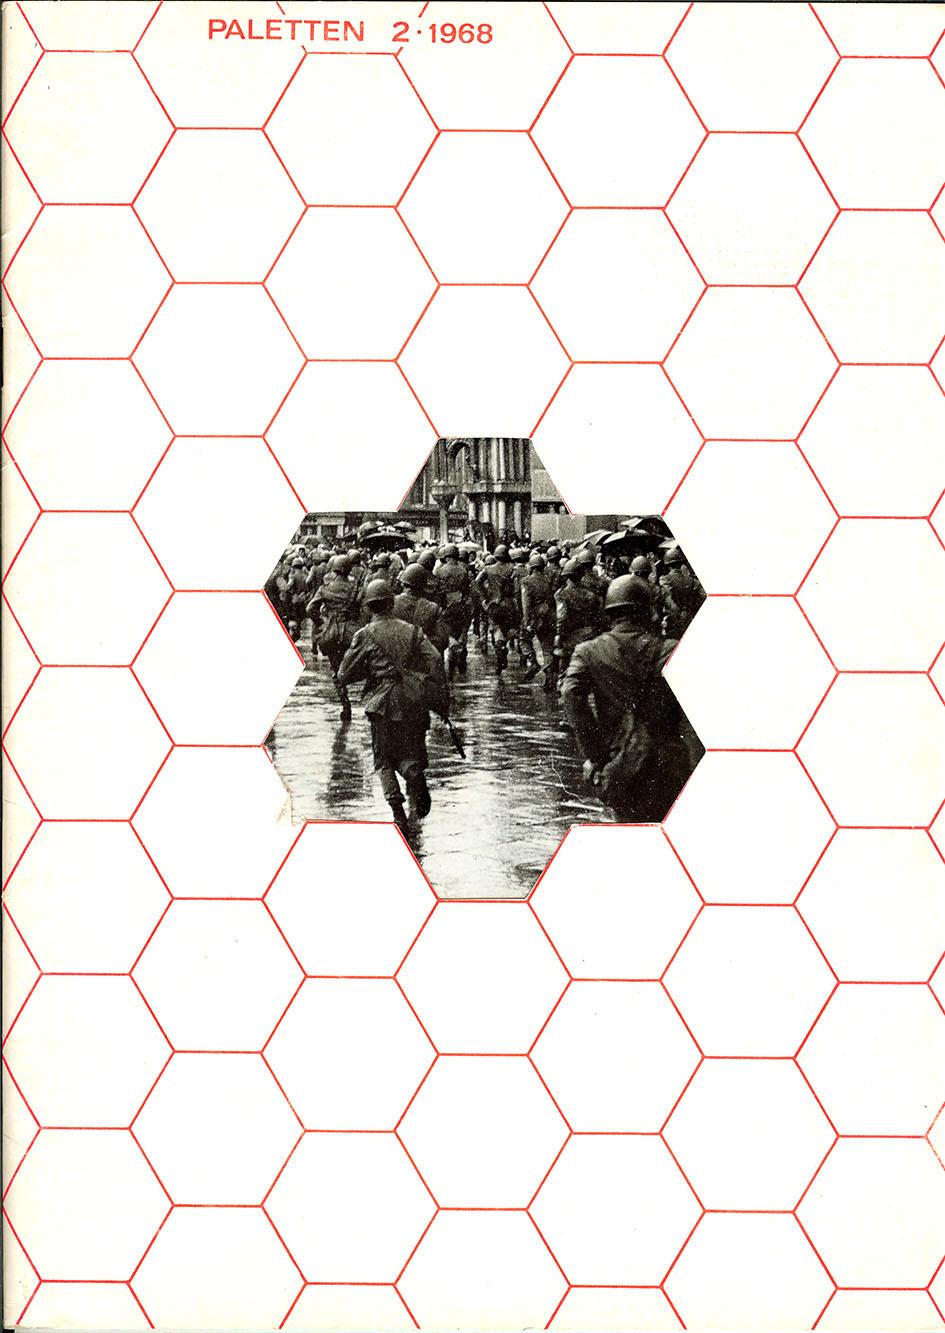 Sivert Lindblom Paletten Nr 2 1968 1-